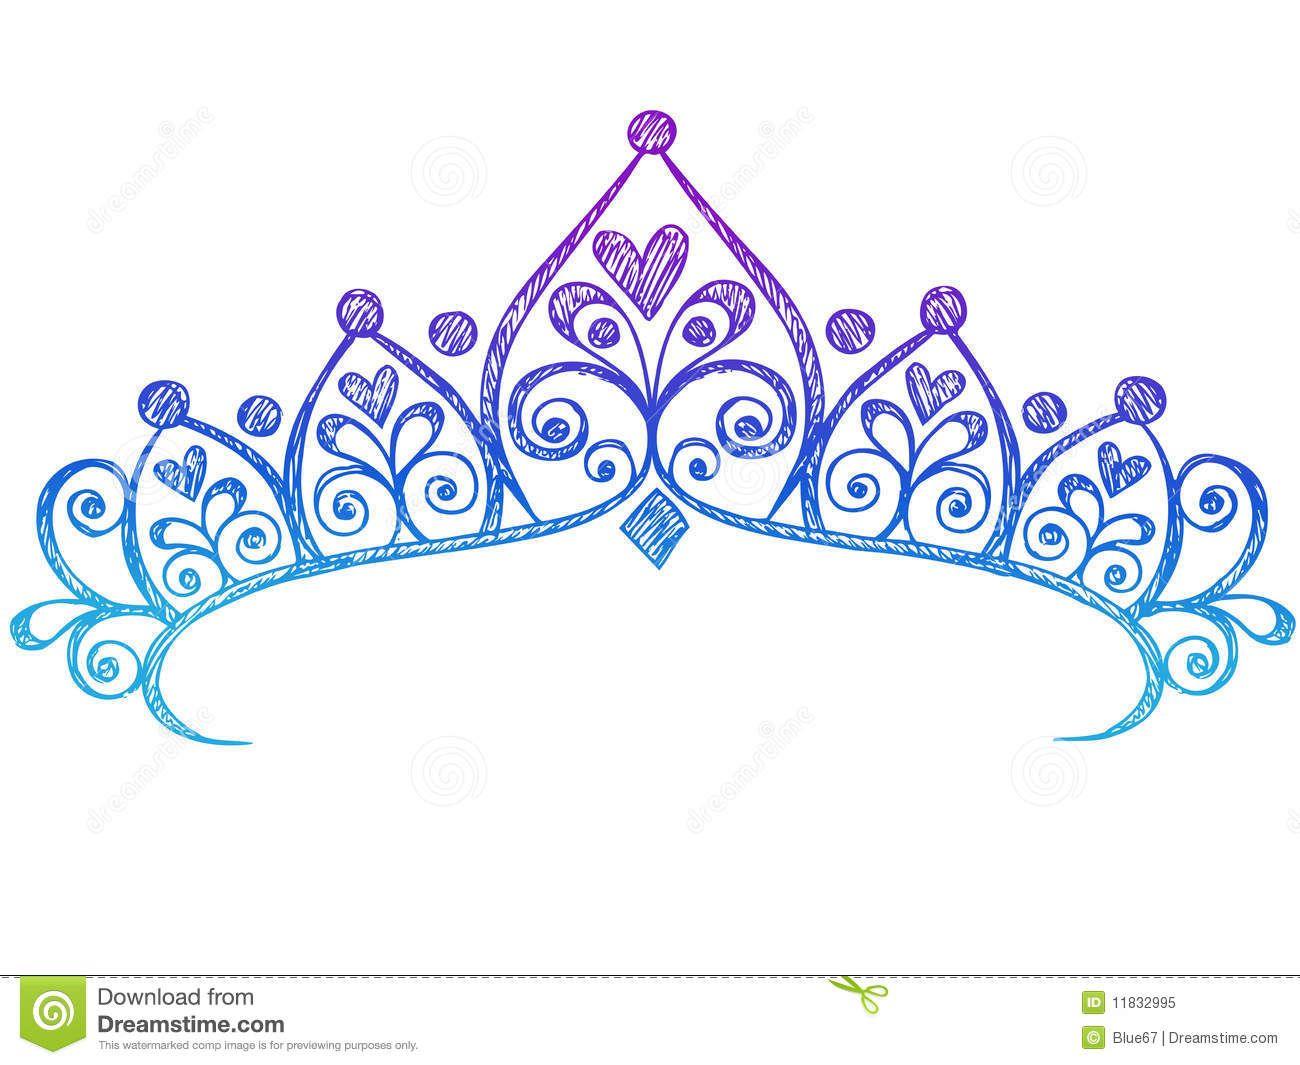 Coroa De Princesa Desenho: Dreamstime Notebook Sketch